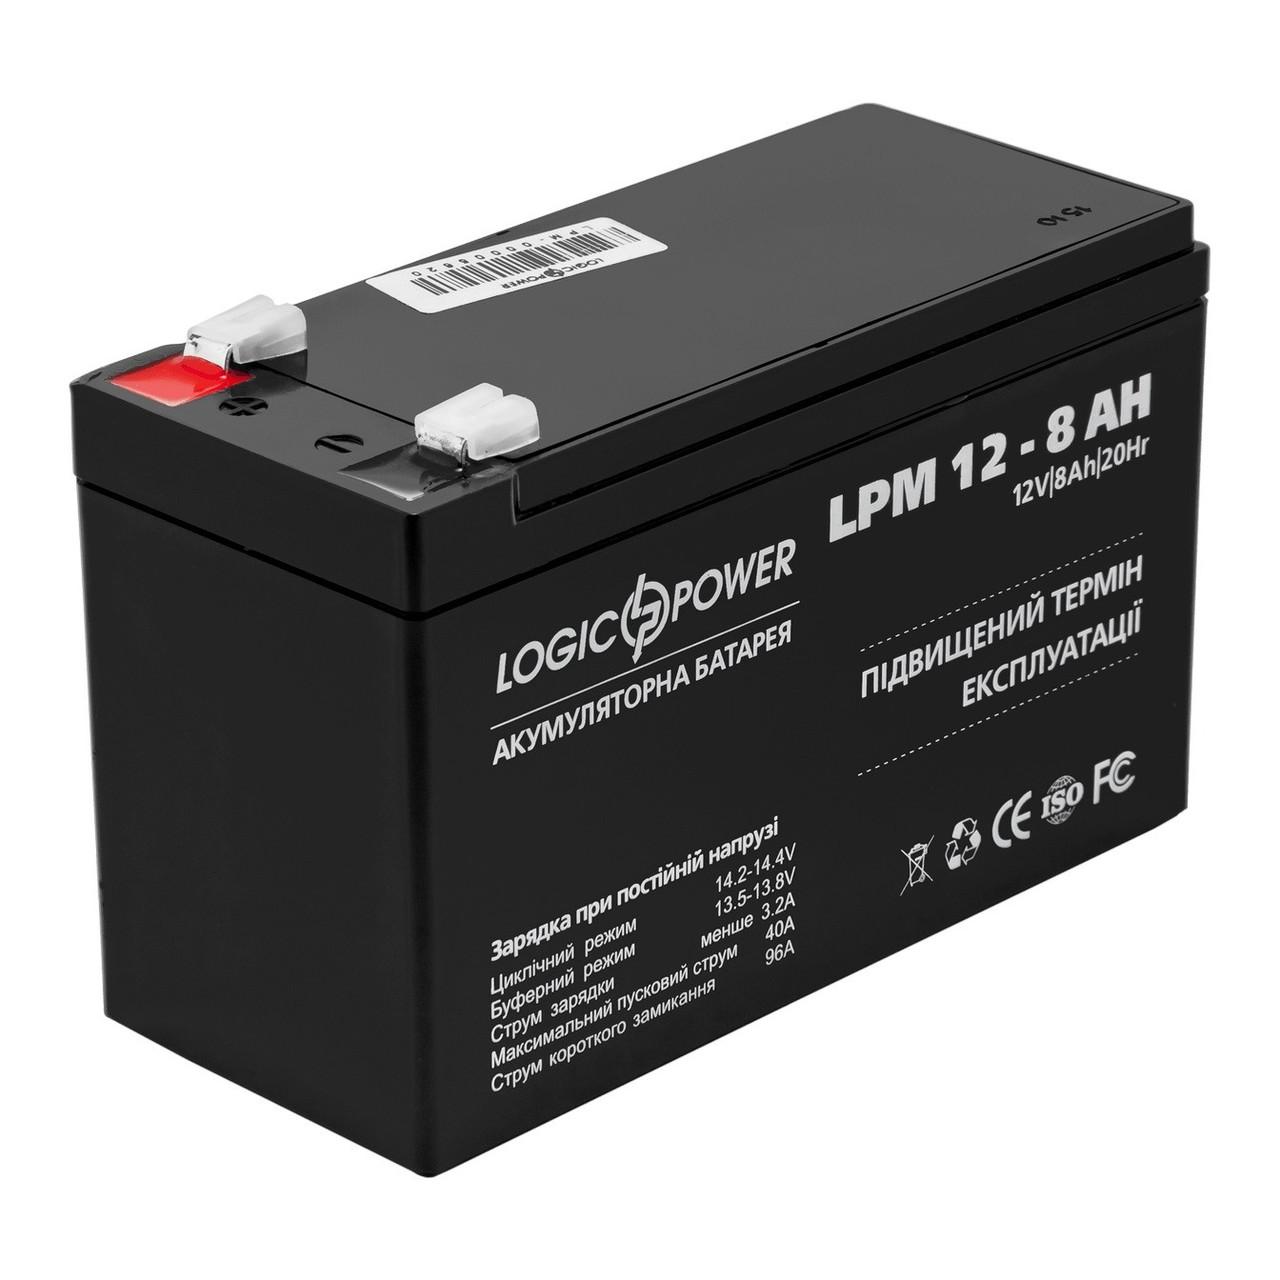 Акумуляторна батарея LogicPower 12В 8.0 AH (LPM 12 - 8.0 AH) AGM